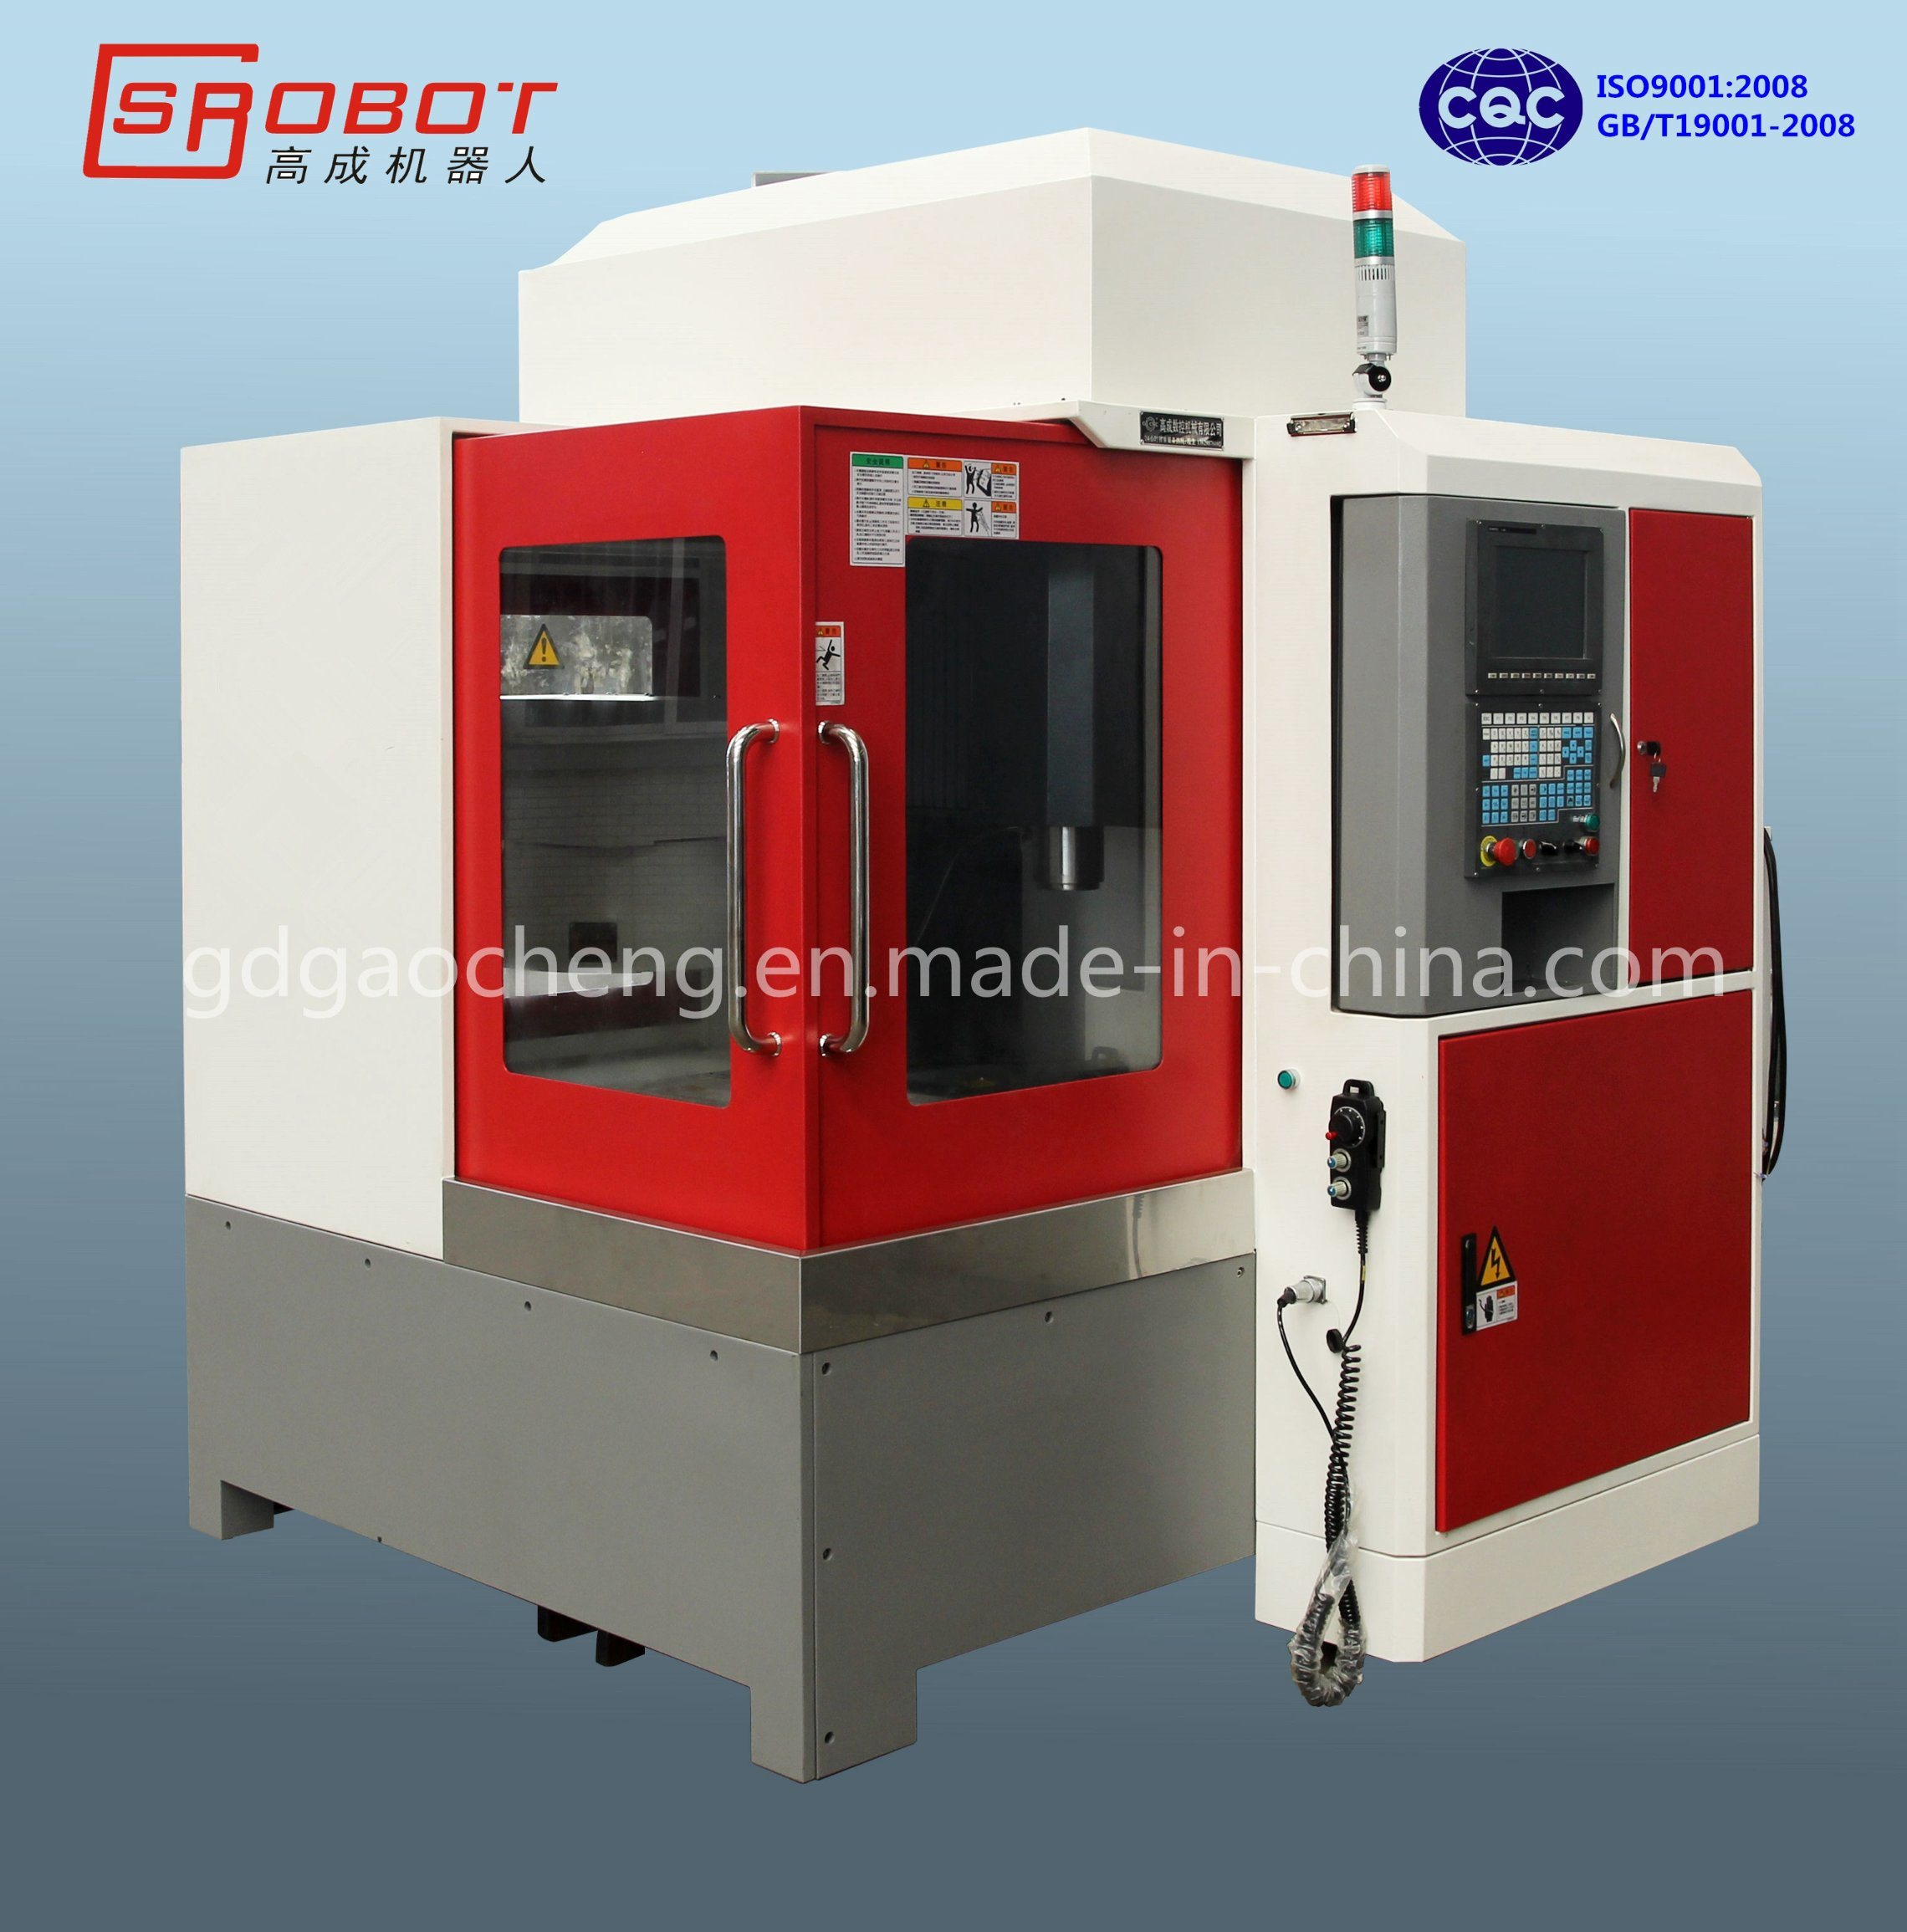 500 X 600mm High Speed CNC Milling & Engraving Machine GS-E650